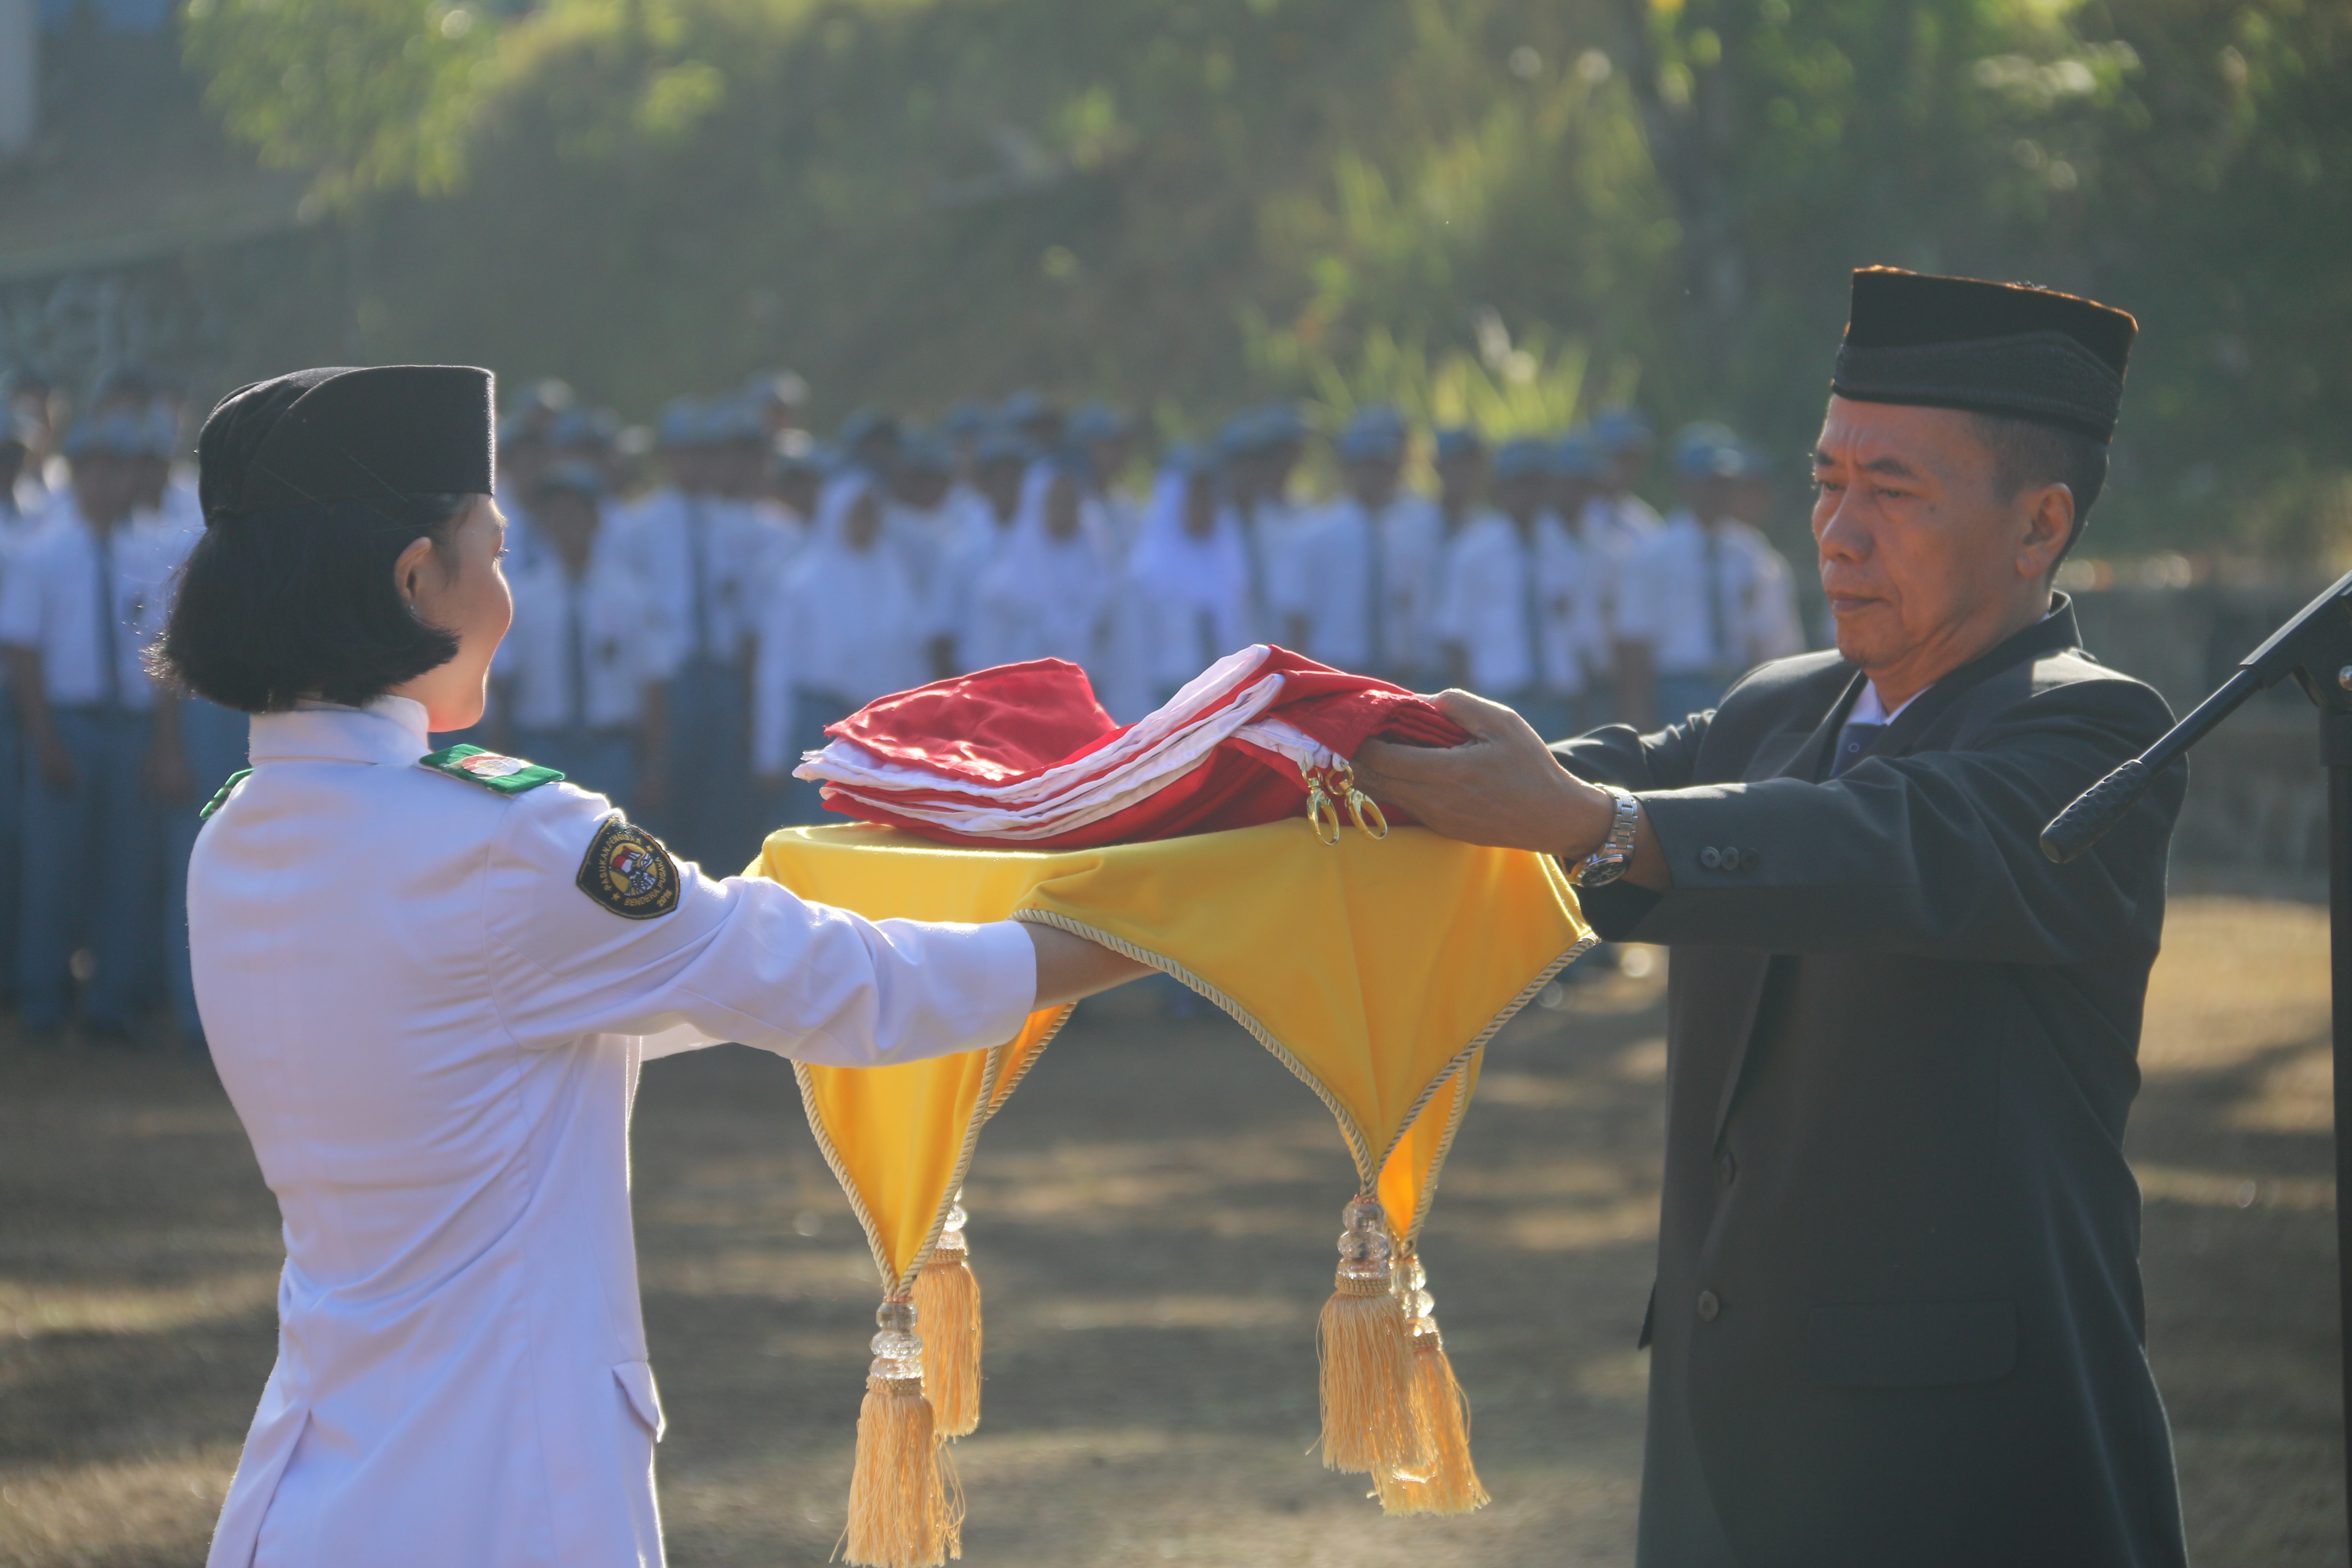 Penyerahan Bendera Merah Putih Dari Kepala Sekolah Untuk Selanjutnya Dikibarkan di Upacara HUT RI ke 73